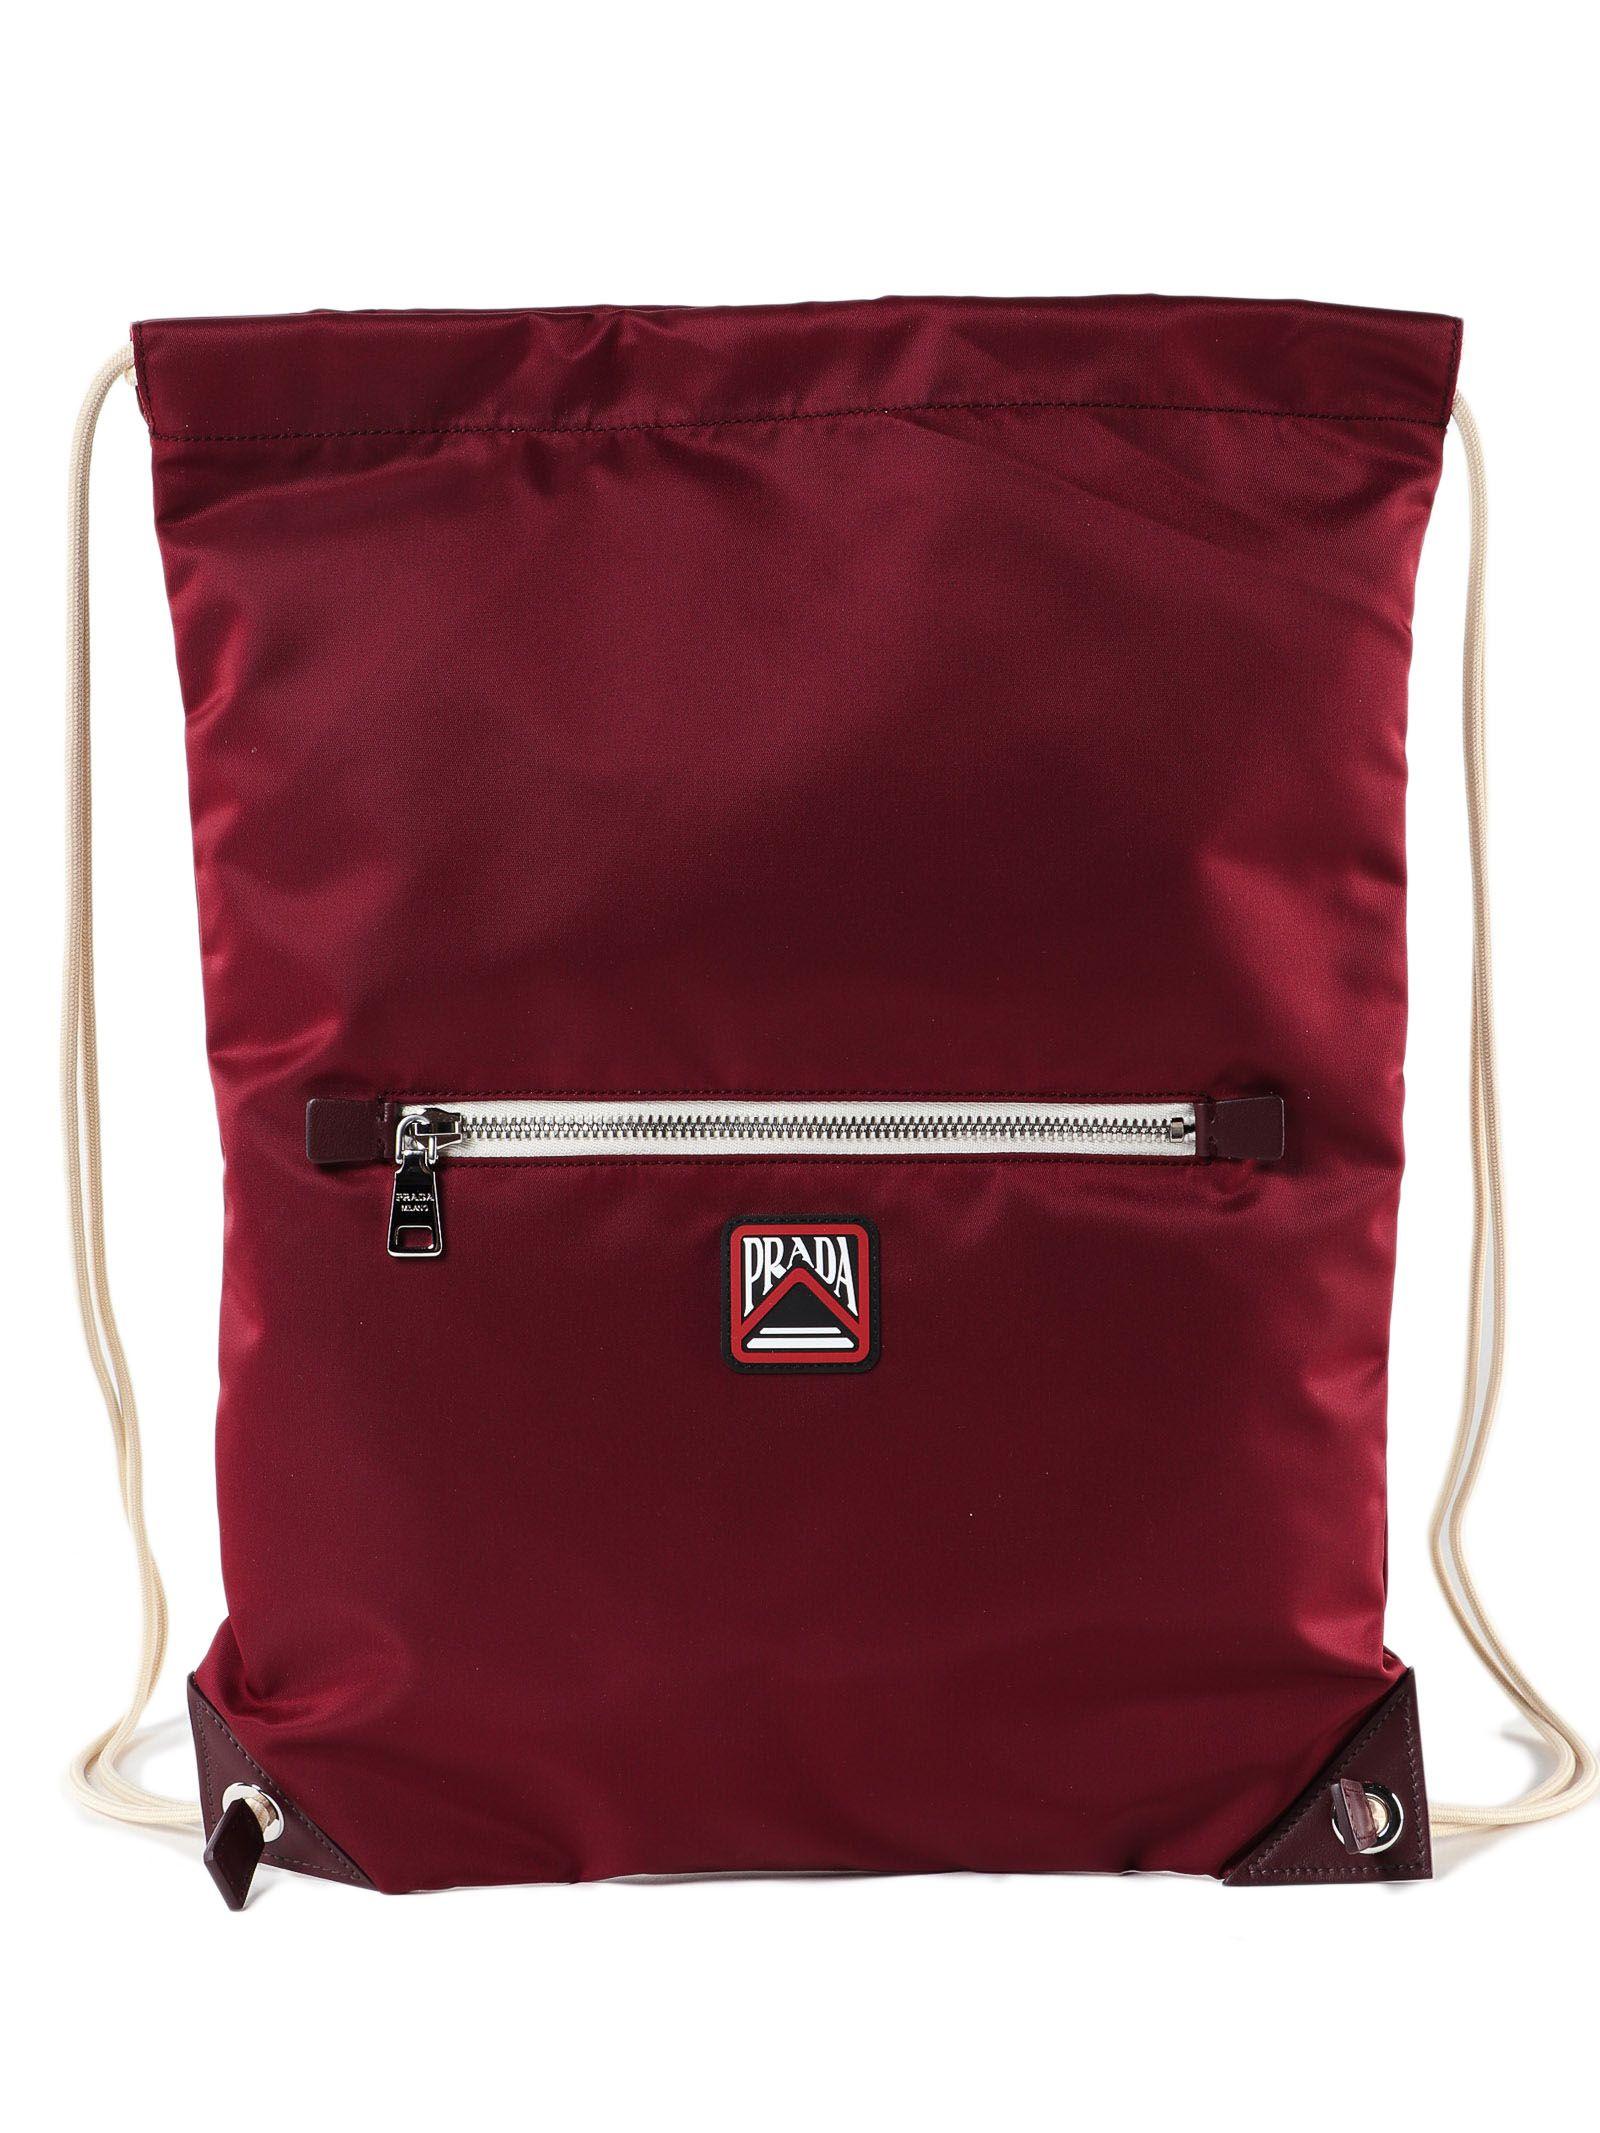 d91688eb369a Prada Prada Drawstring Backpack - Granato - 10795375 | italist